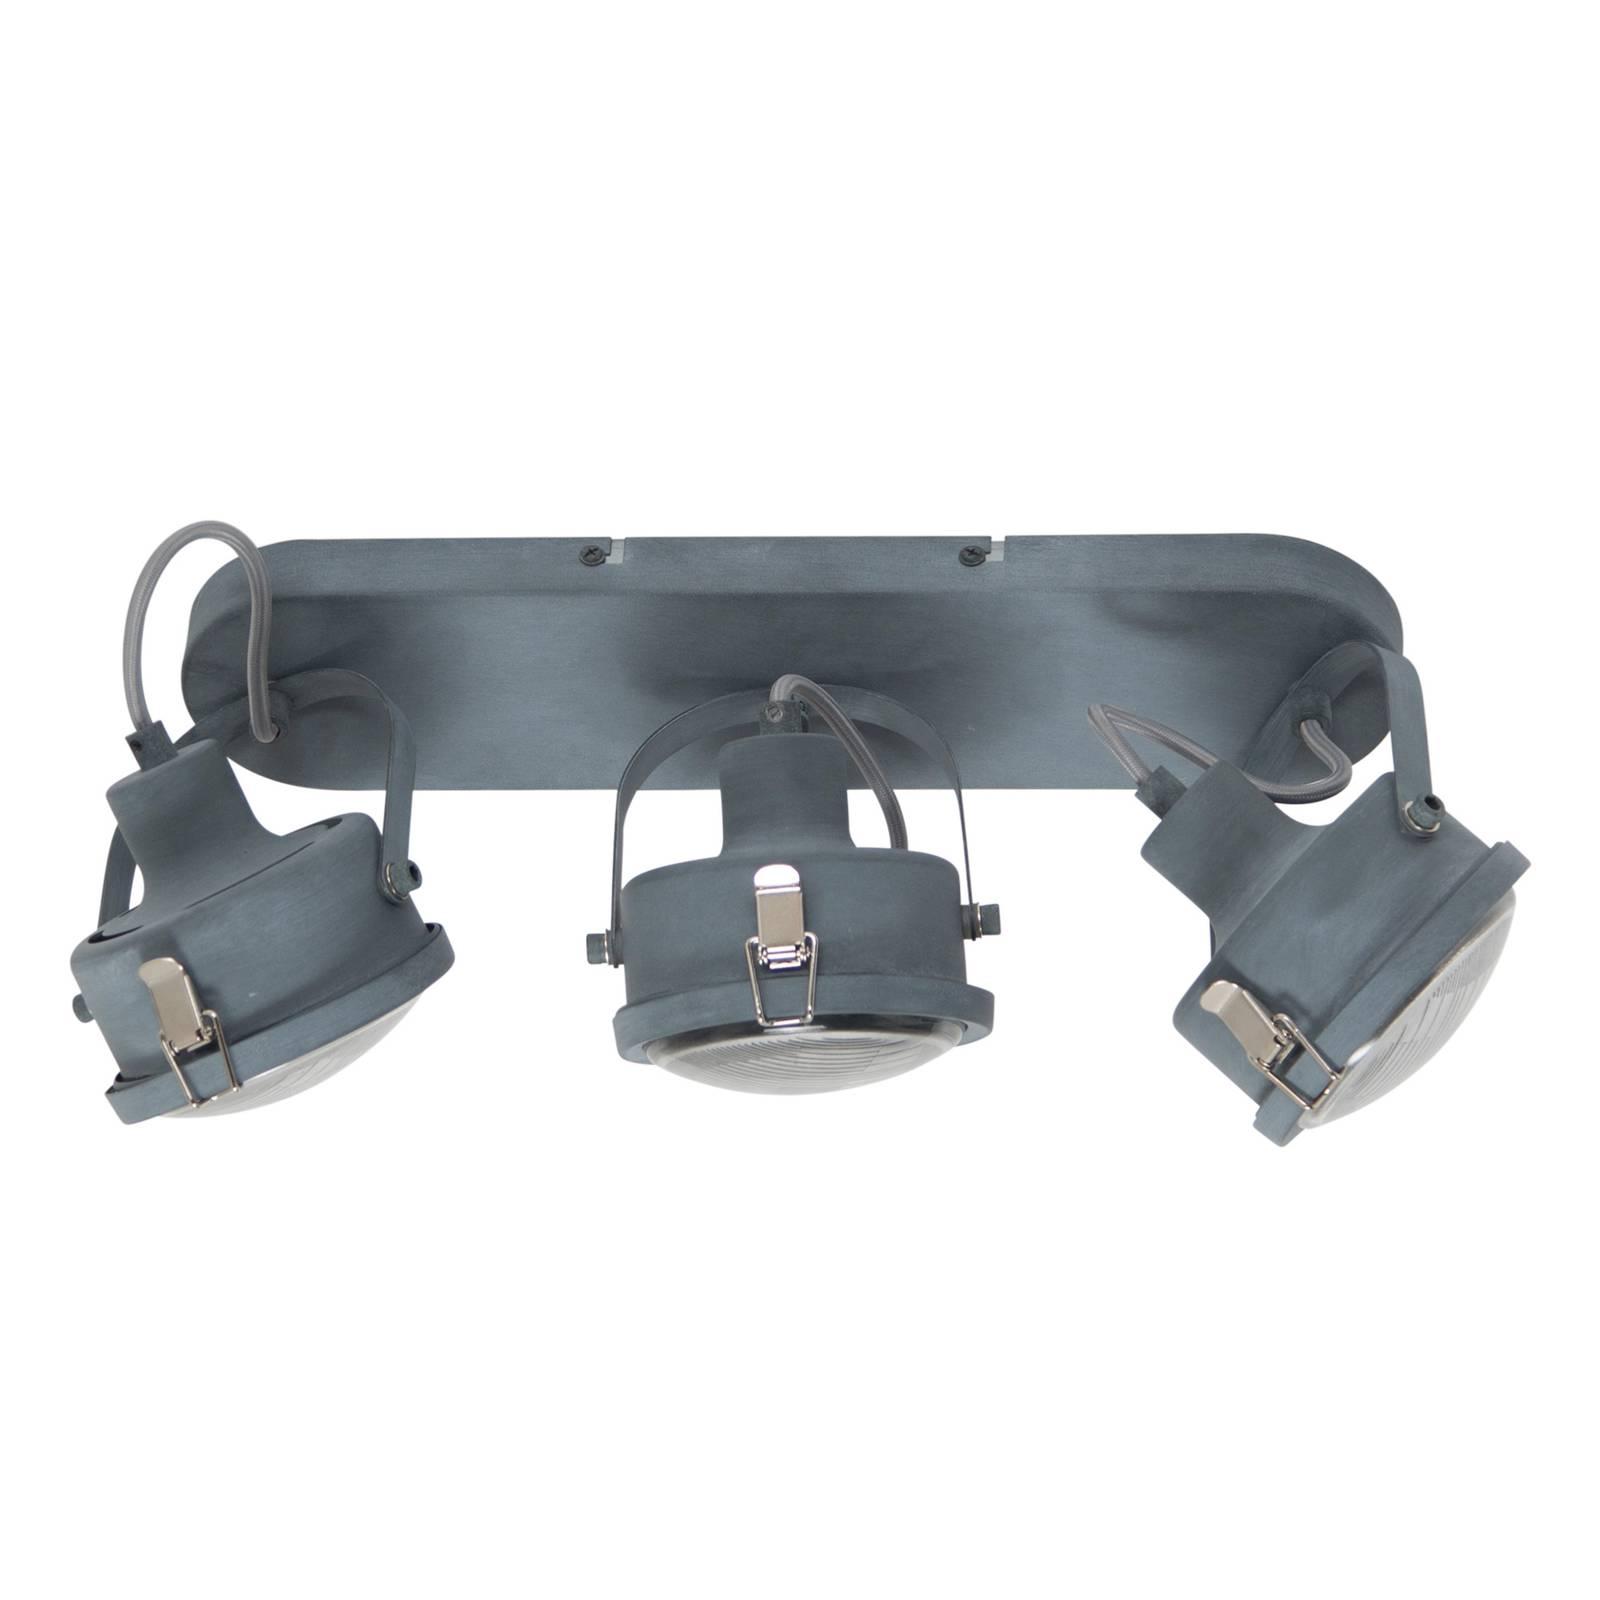 Industriële plafondlamp Satellite in grijs